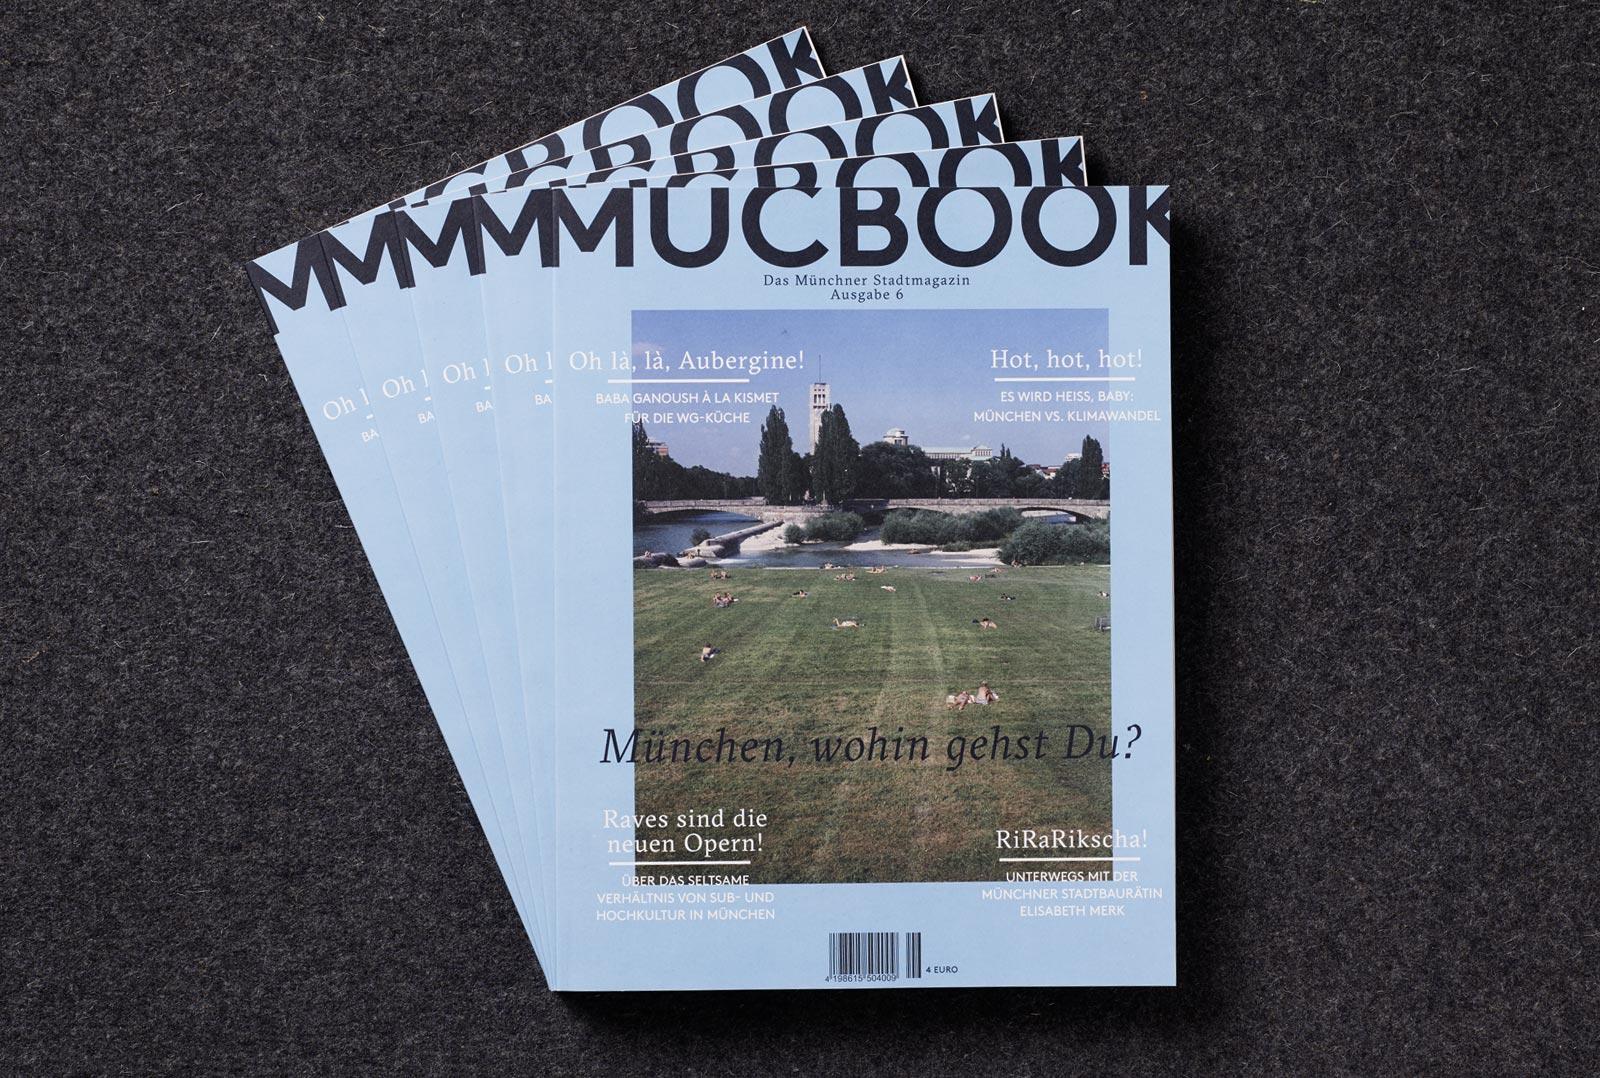 mucbook6_title